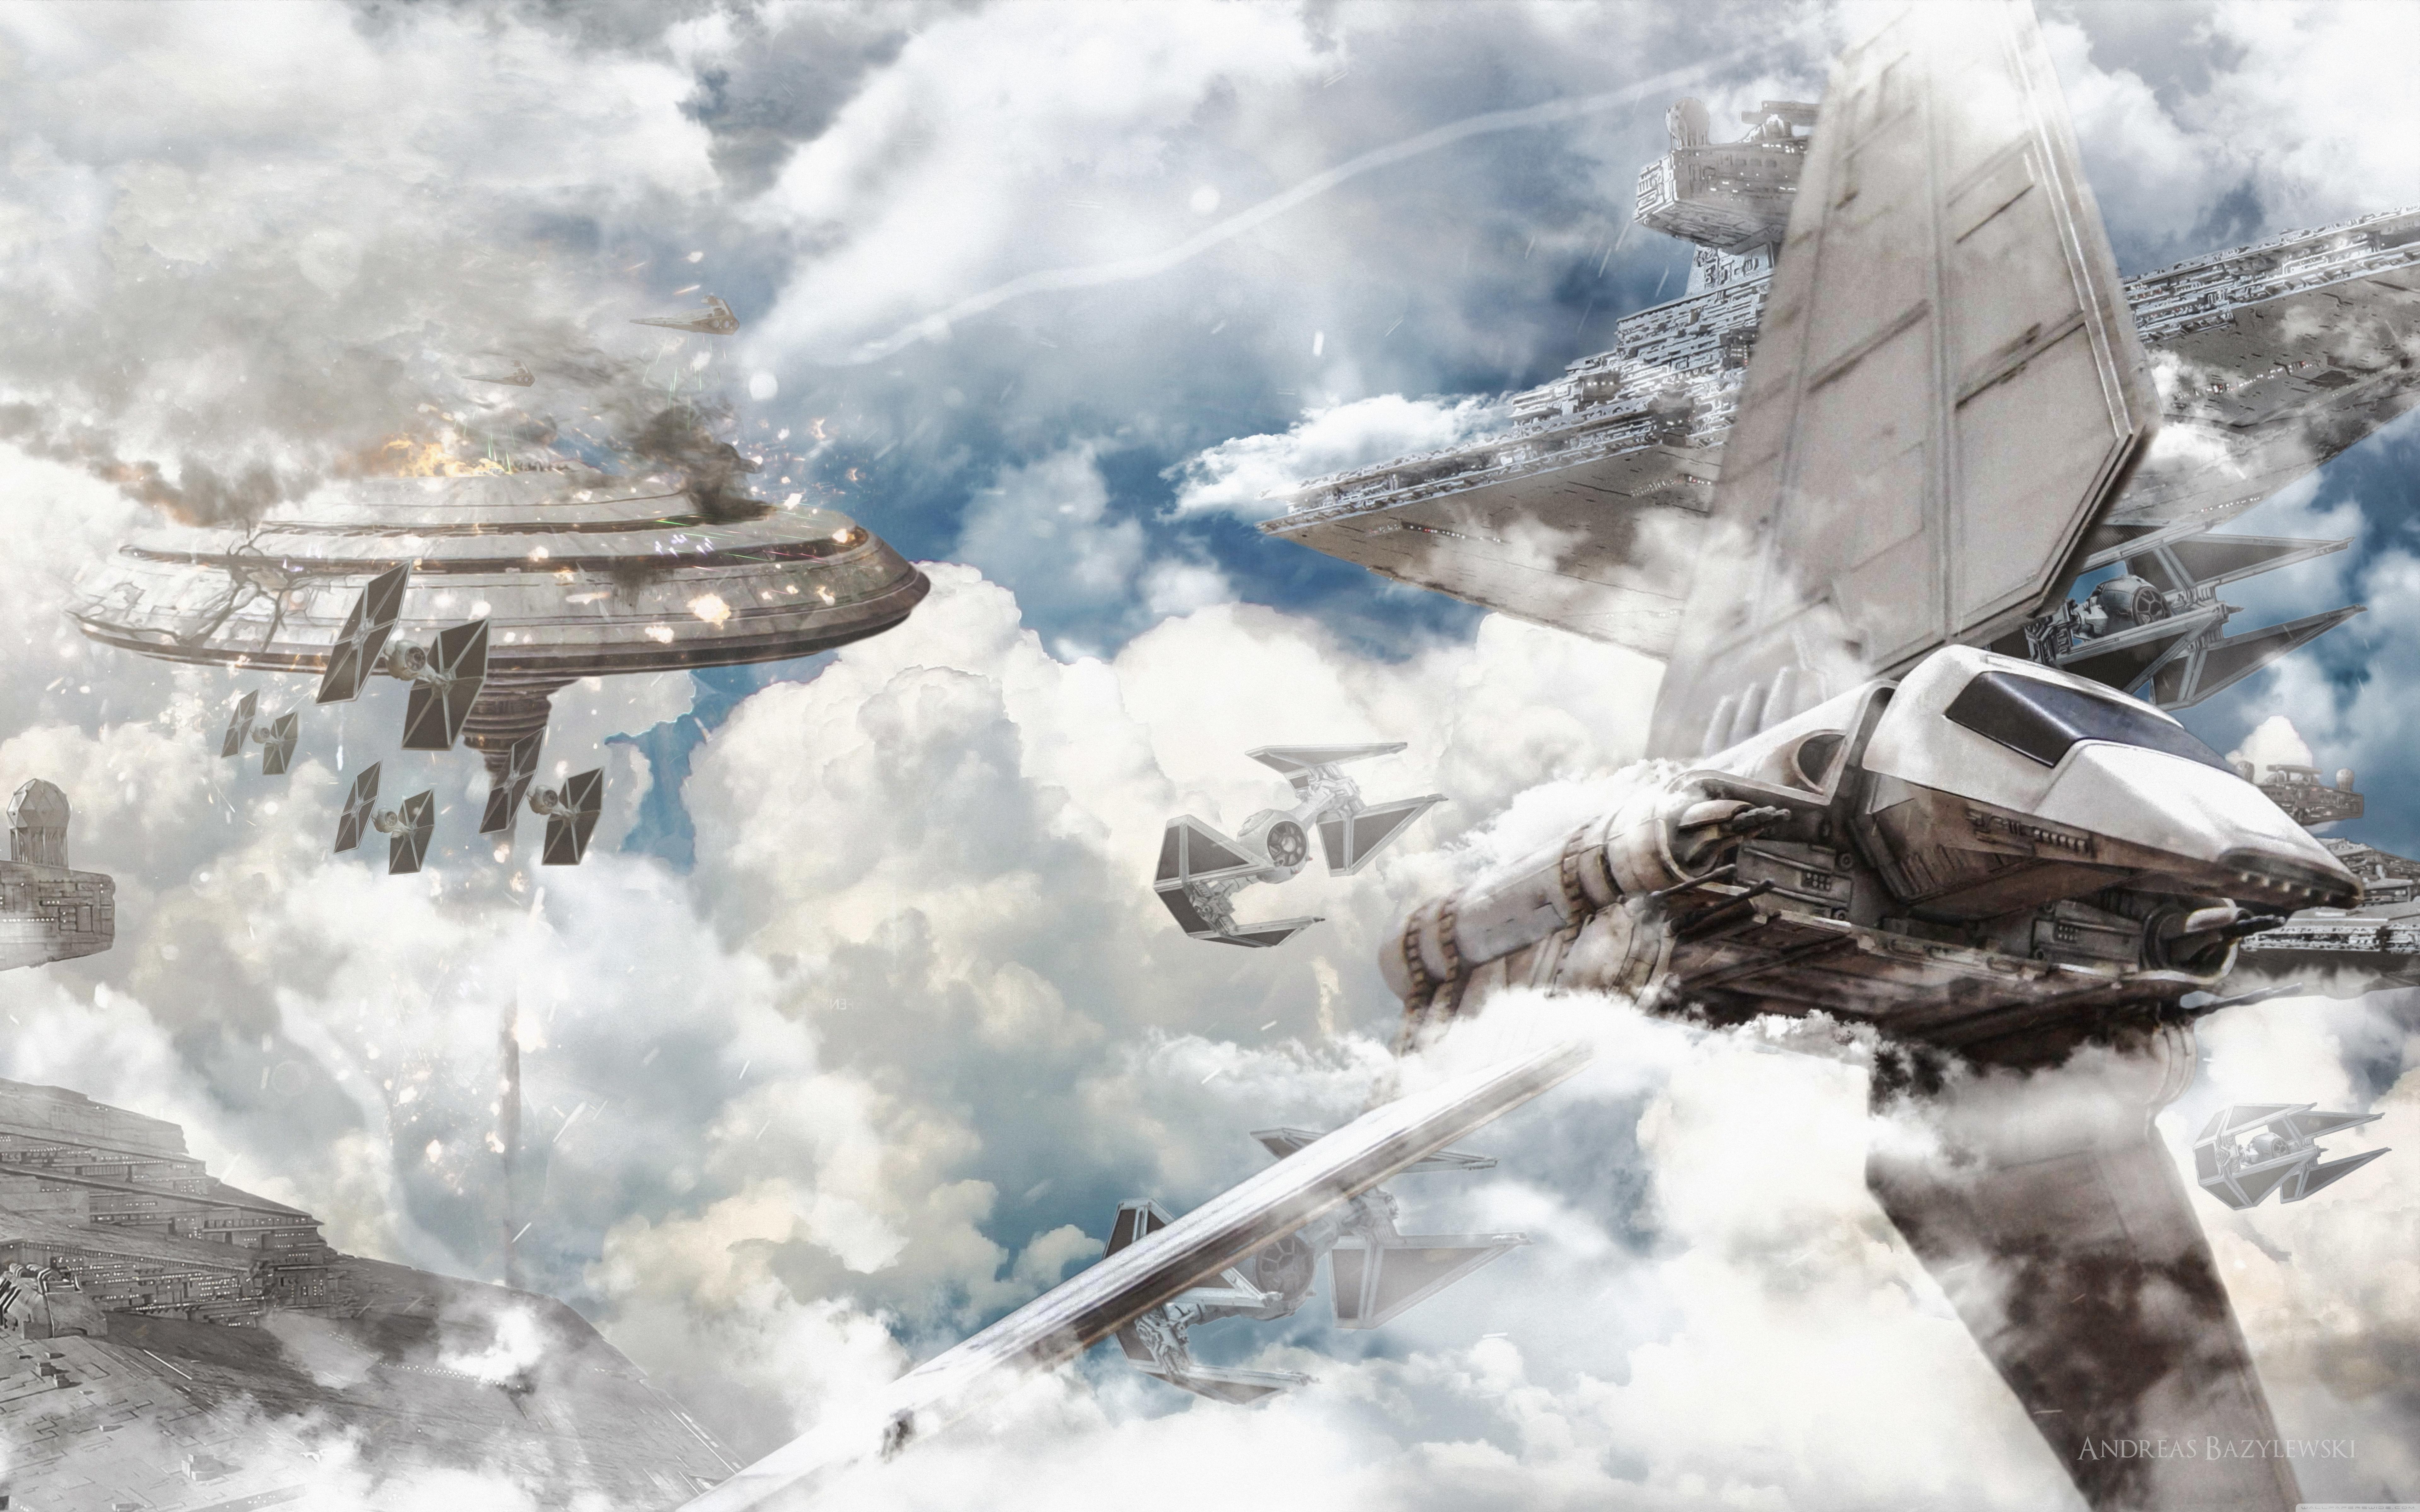 Star Wars Ships Widescreen Wallpaper Hd Is Cool Wallpapers Desktop Wallpaper Star Wars 7680x4800 Wallpaper Teahub Io